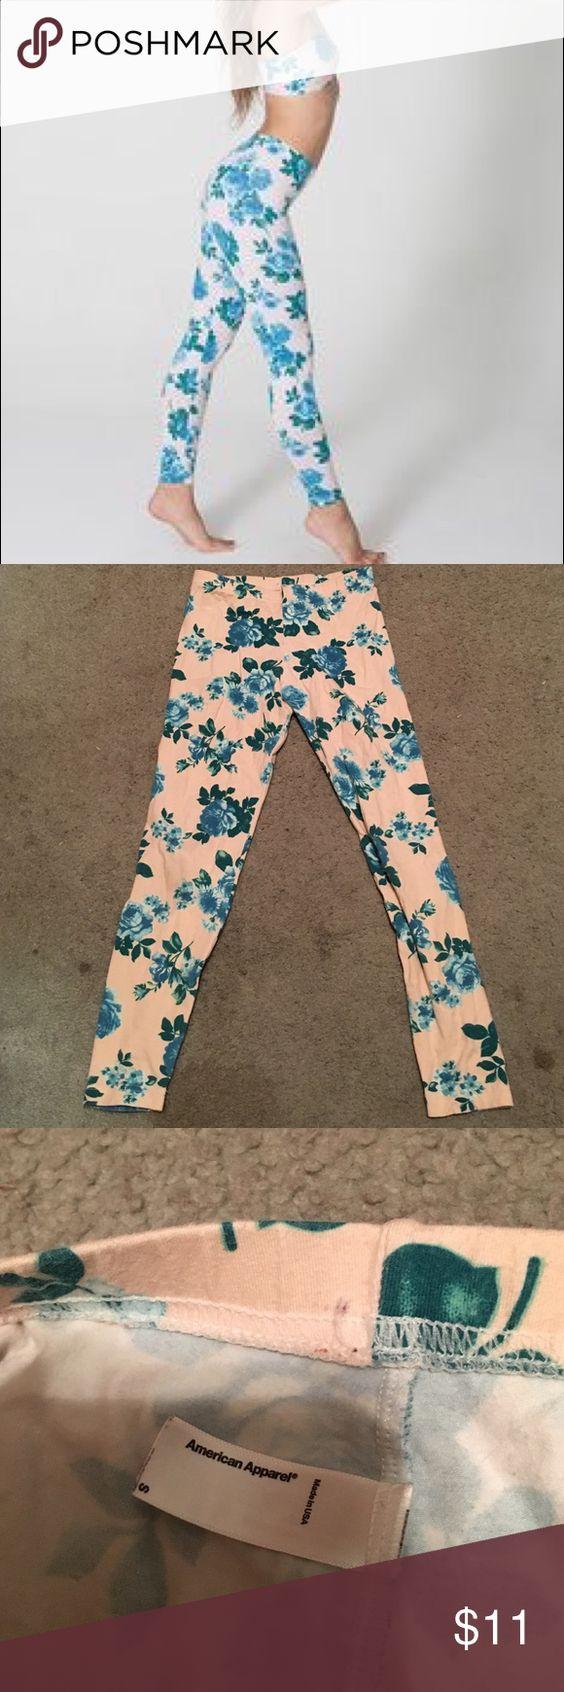 Floral Printed American Apparel Leggings American Apparel leggings in pink and blue floral rose print. Had for a long time but has no obvious flaws. Size: S. American Apparel runs small. American Apparel Pants Leggings